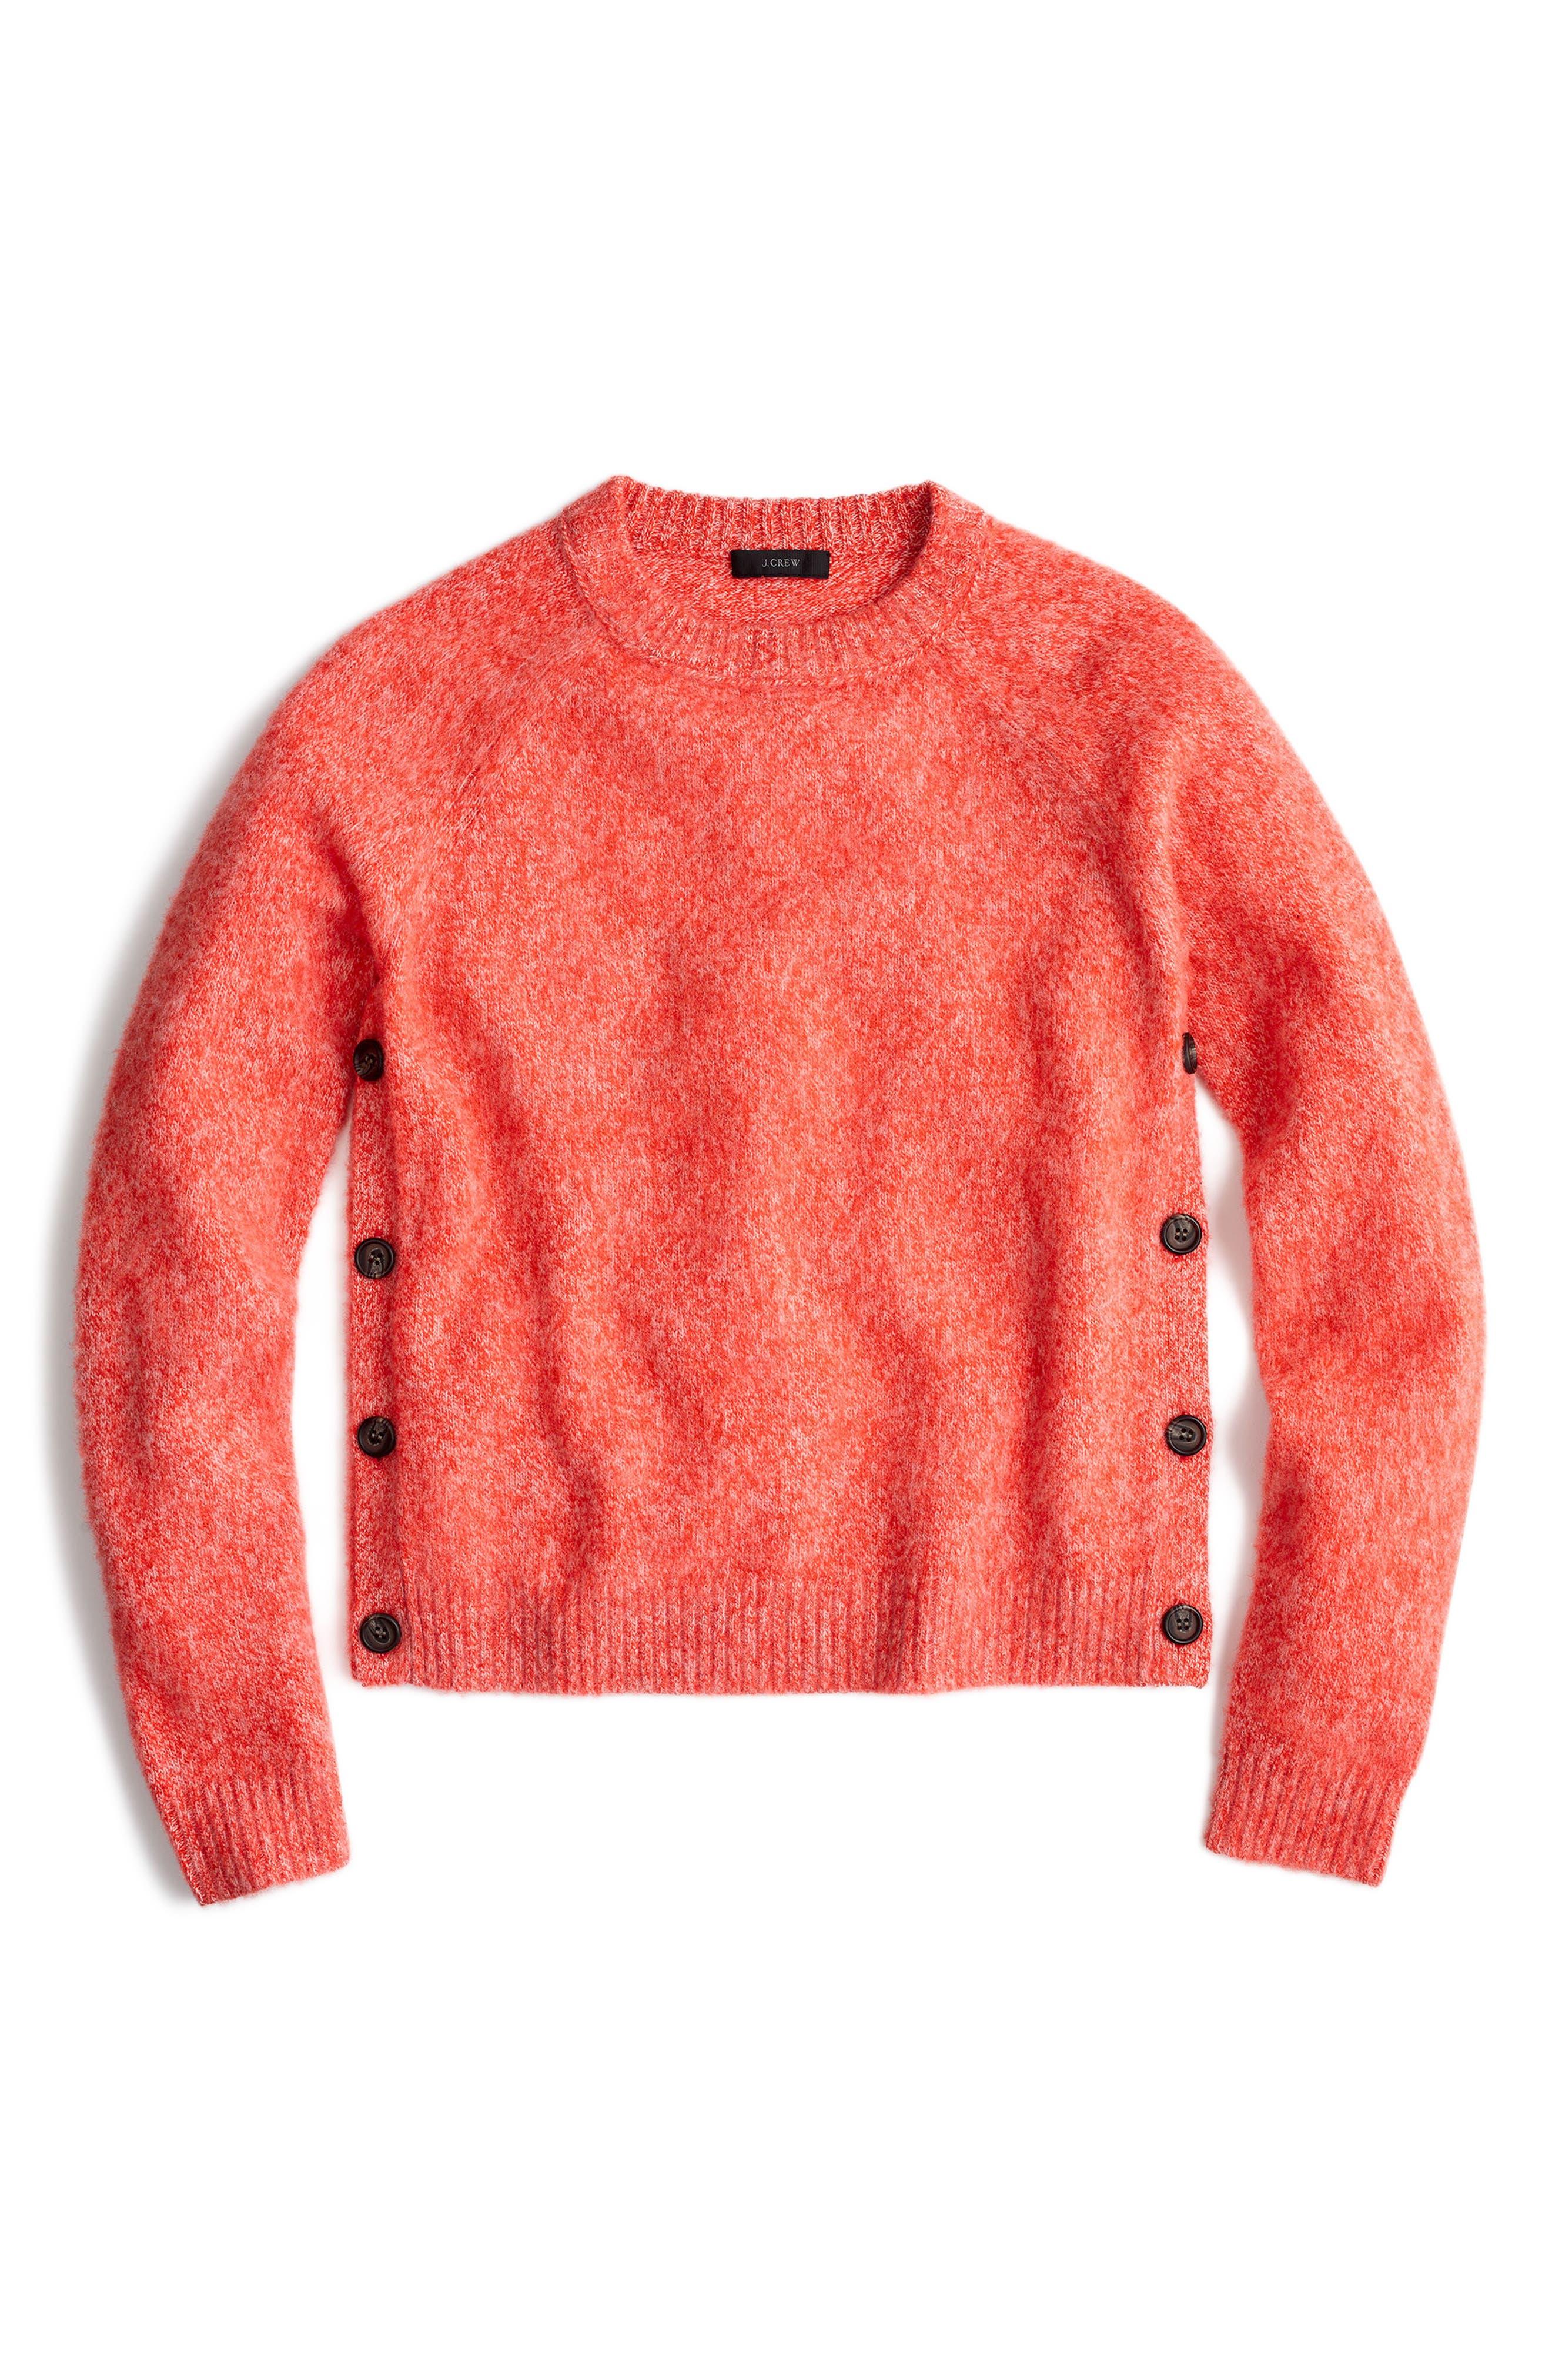 Brushed Shrunken Lambswool Crewneck Sweater,                             Alternate thumbnail 3, color,